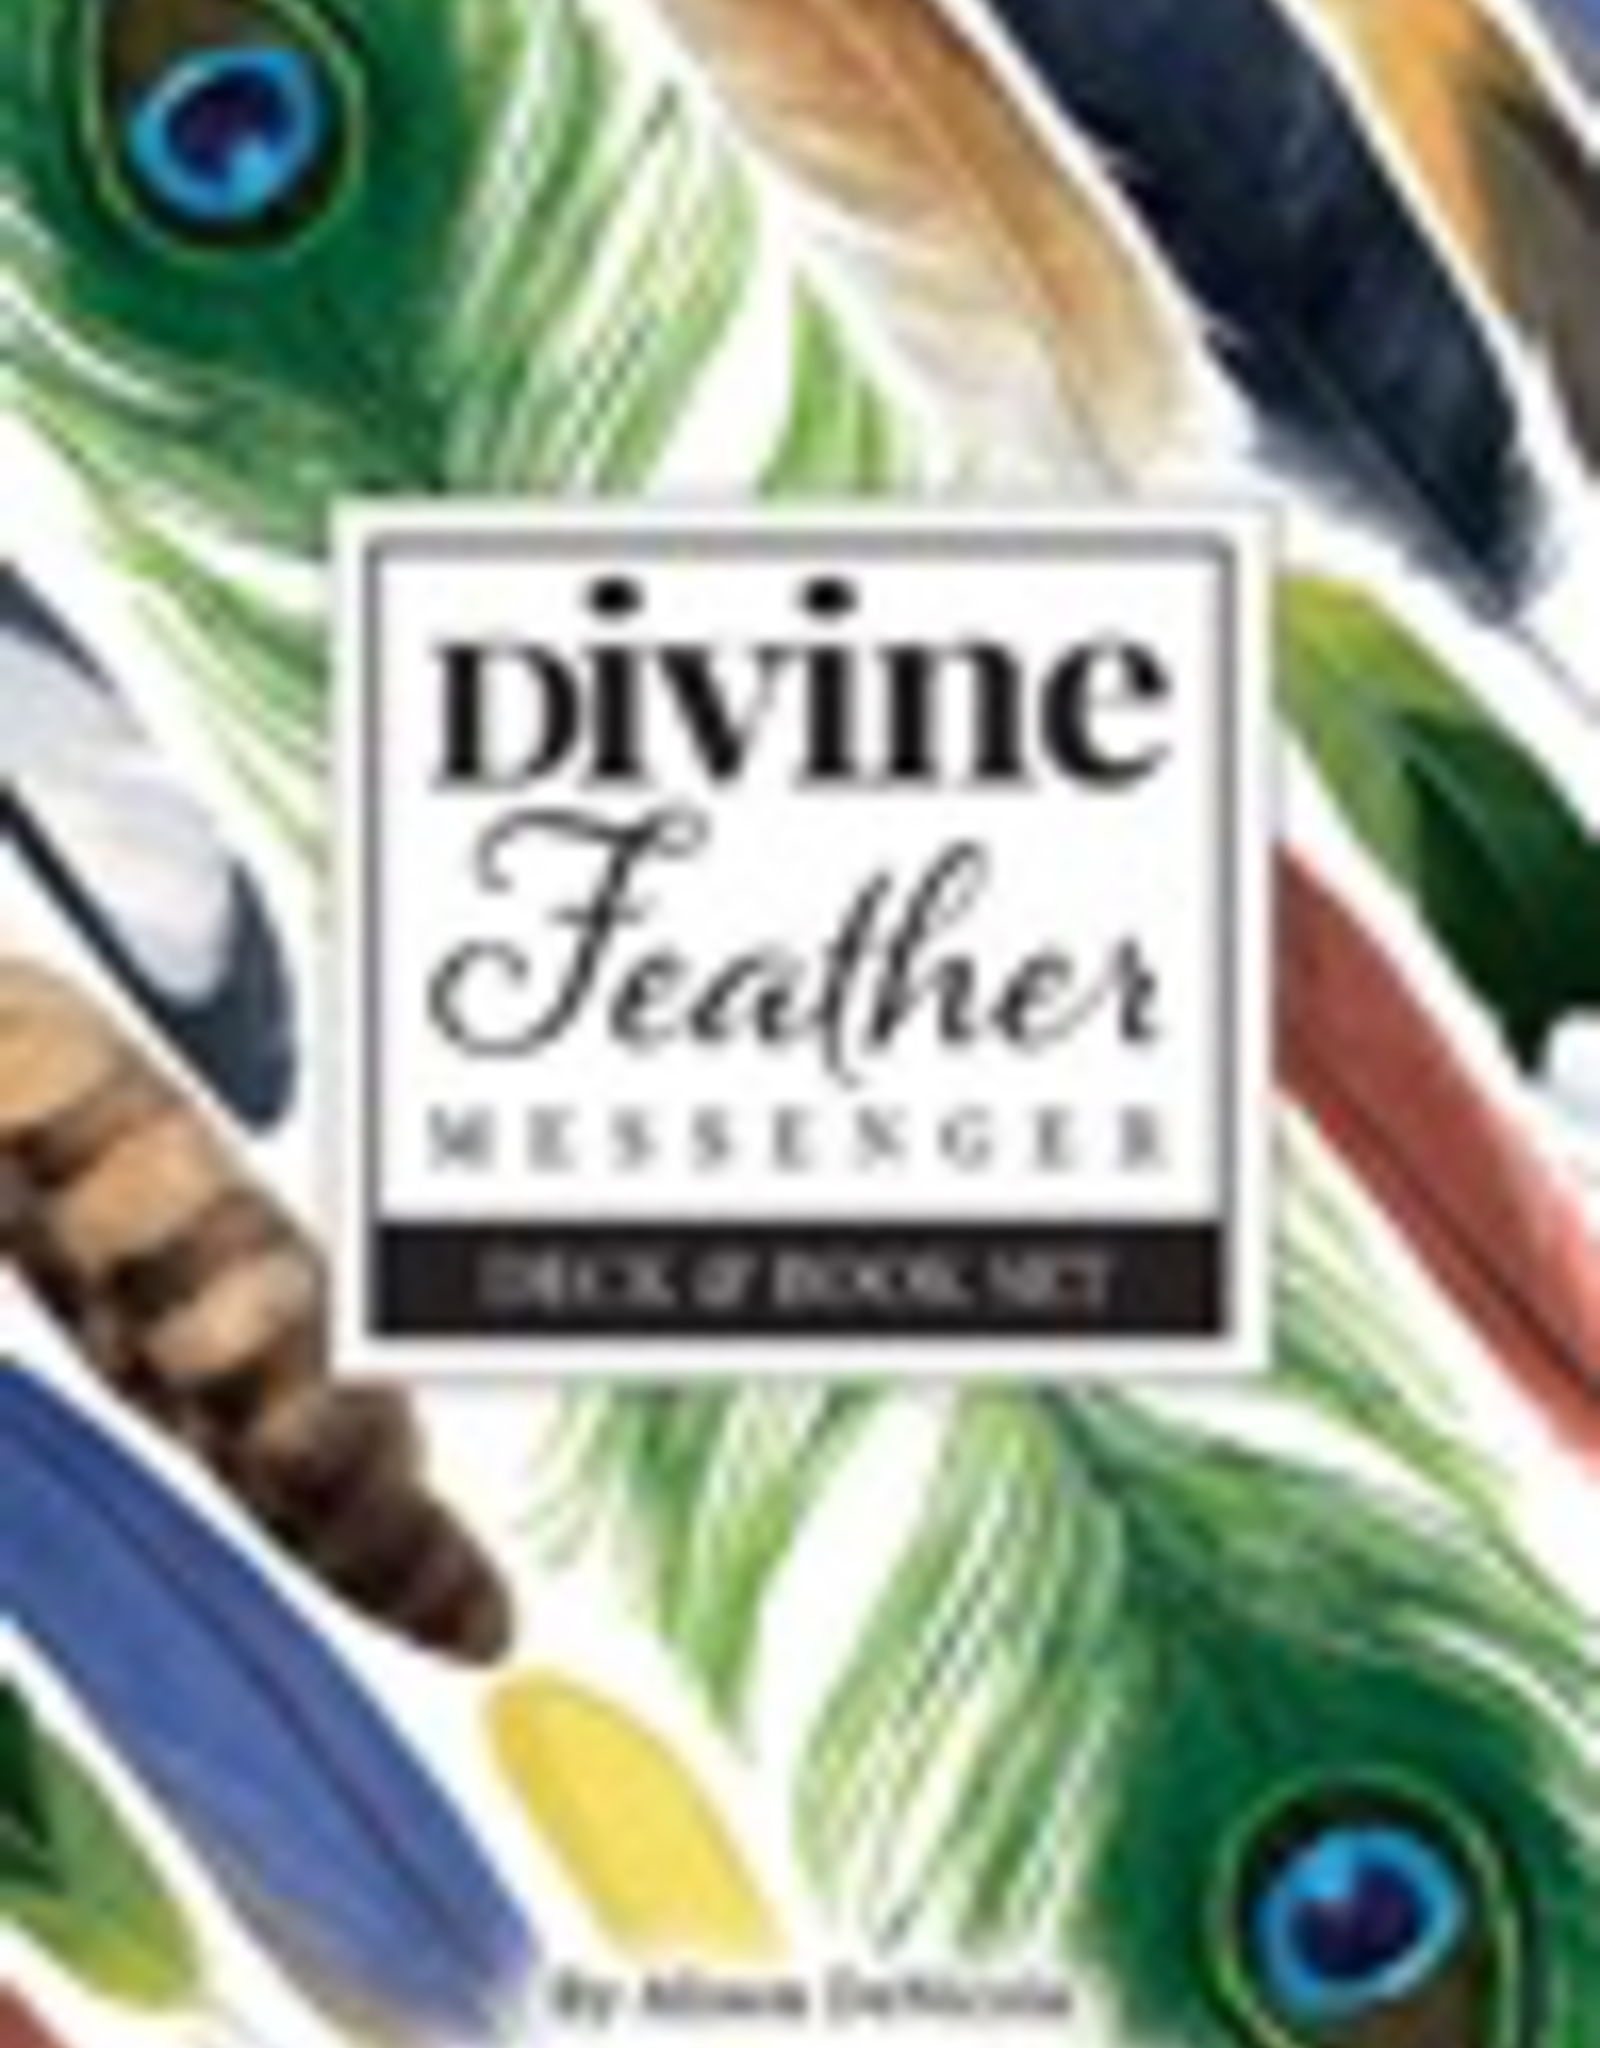 Divine Feather Messenger Deck